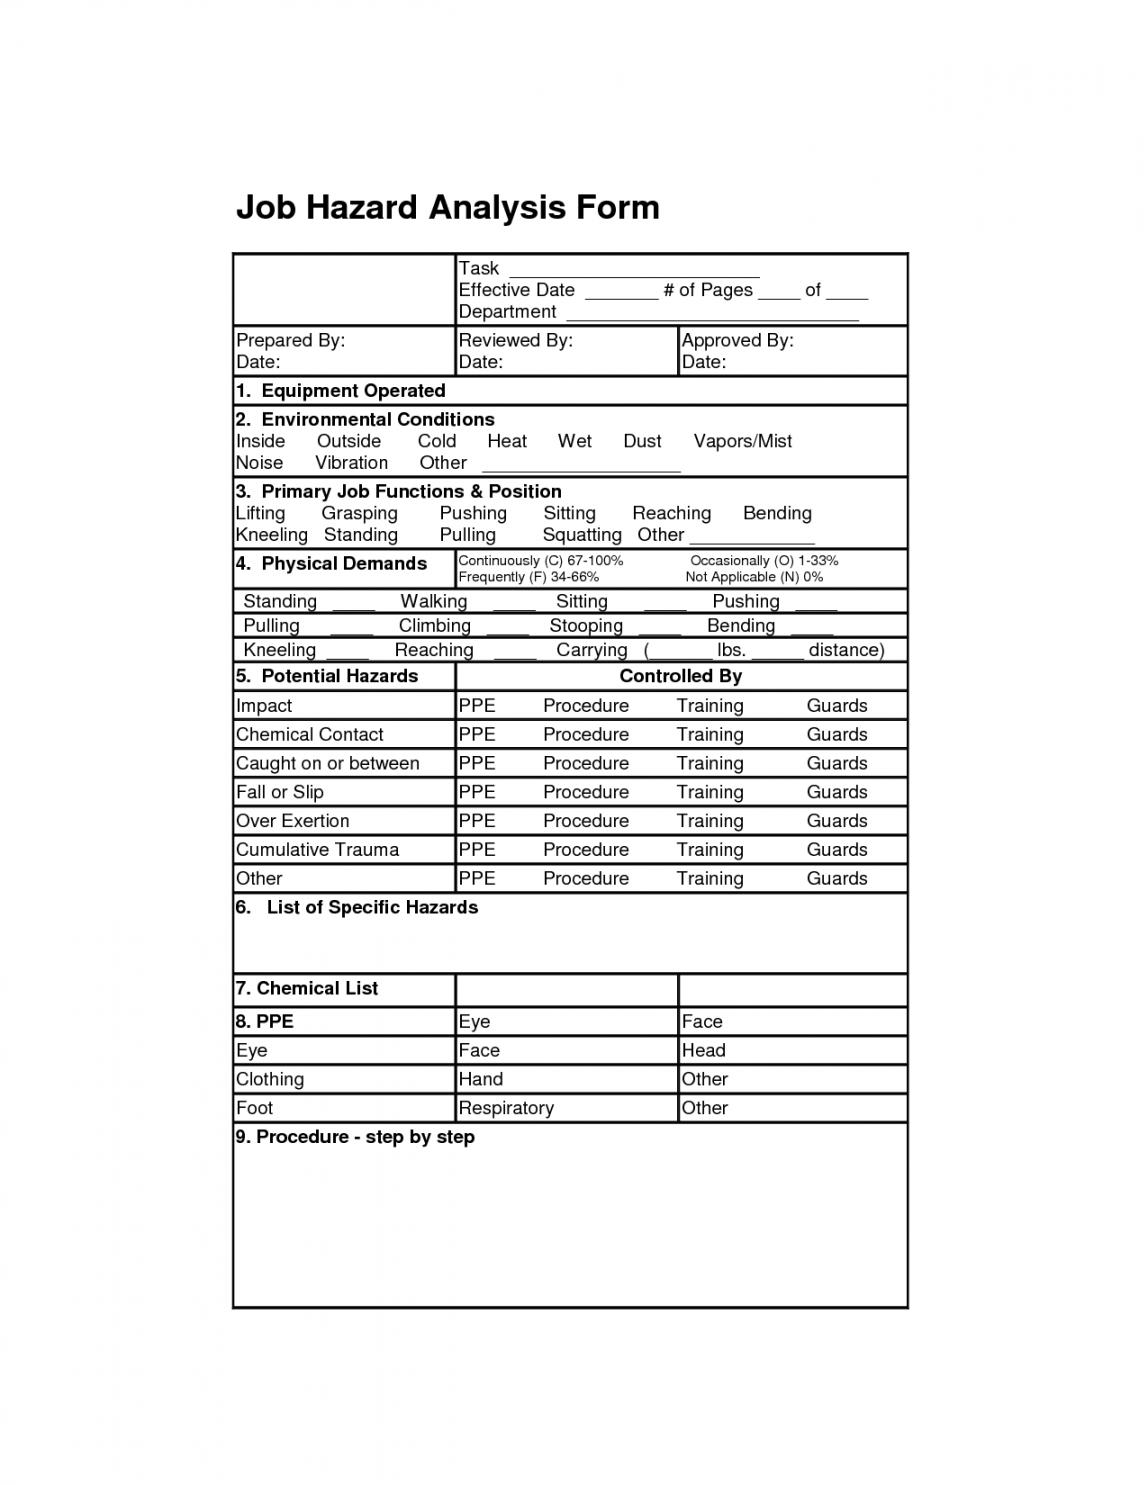 Printable Job Hazardysis Form Safety Engineering Job